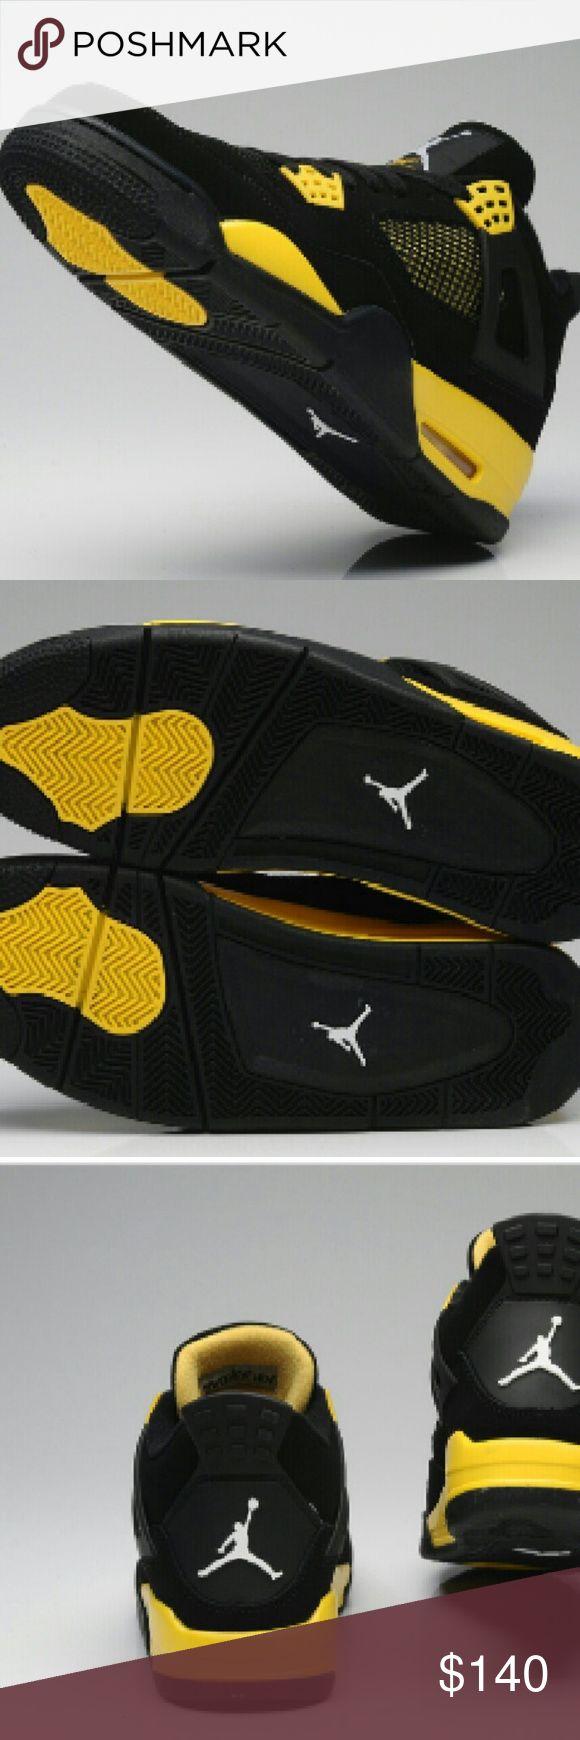 Jordan 14 s retro Jordan Jordan  Shoes Athletic Shoes